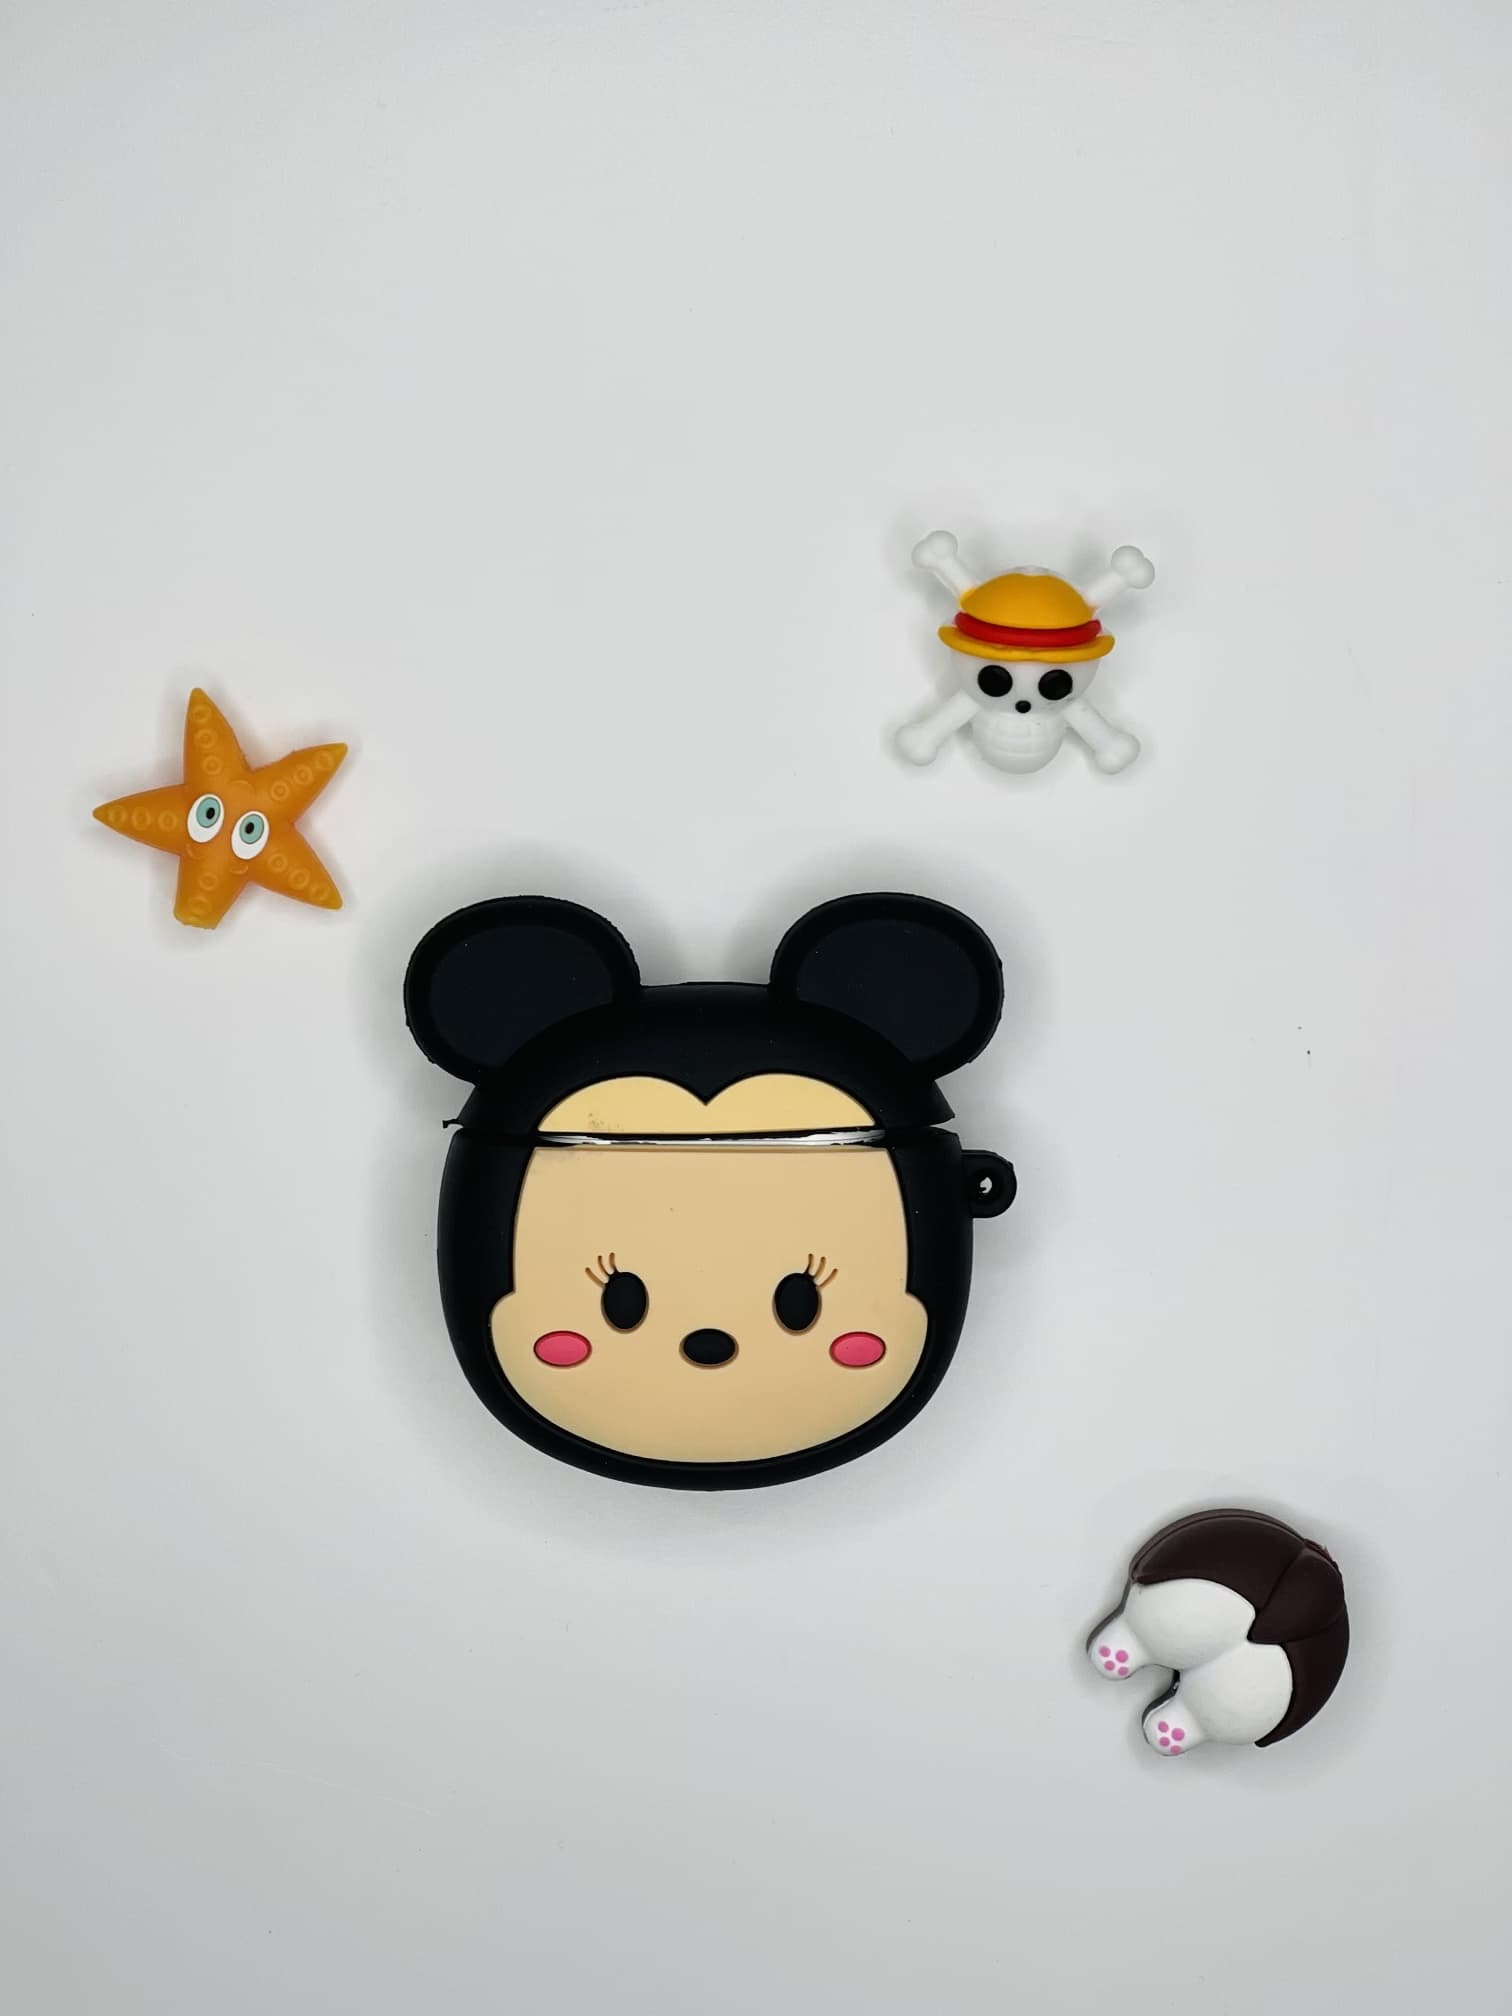 Miky Mouse Figürlü AirPods 2 Kılıfı